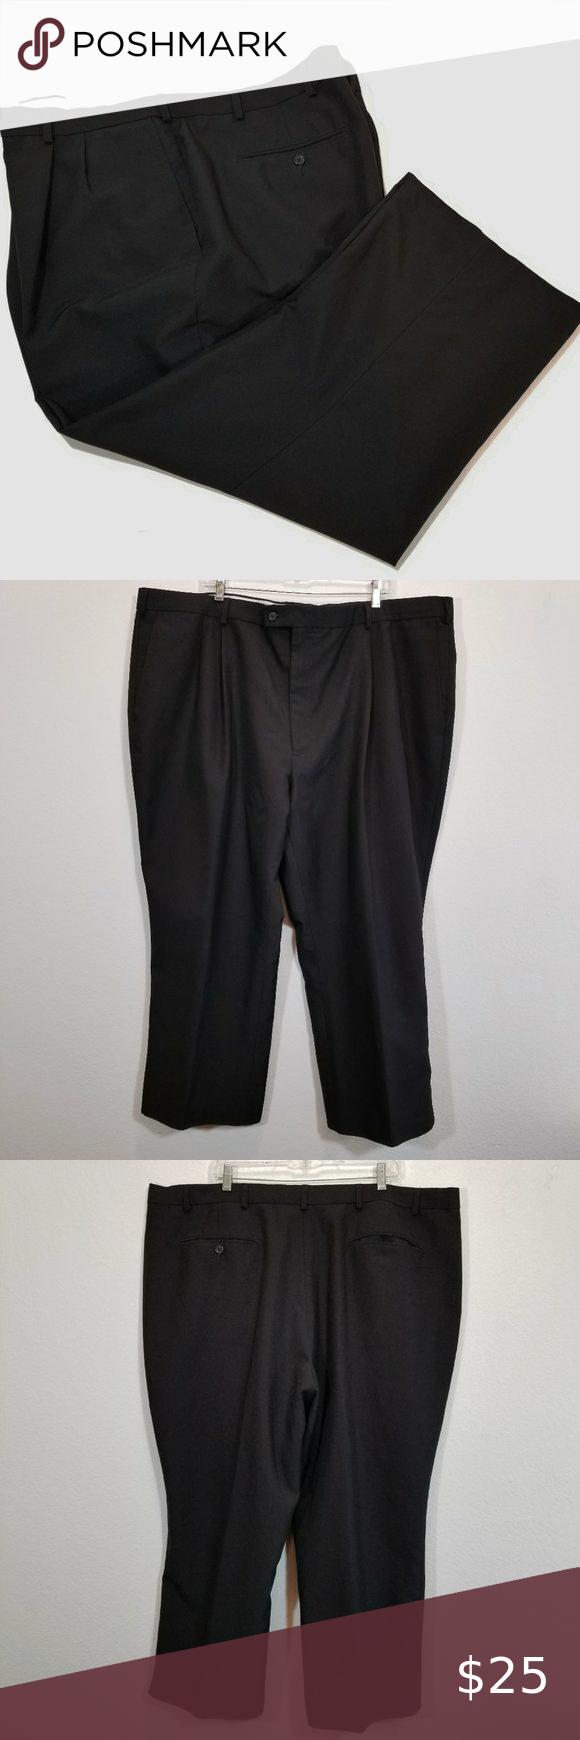 Haband Mens Dress Pants Size 37 x 31 Black